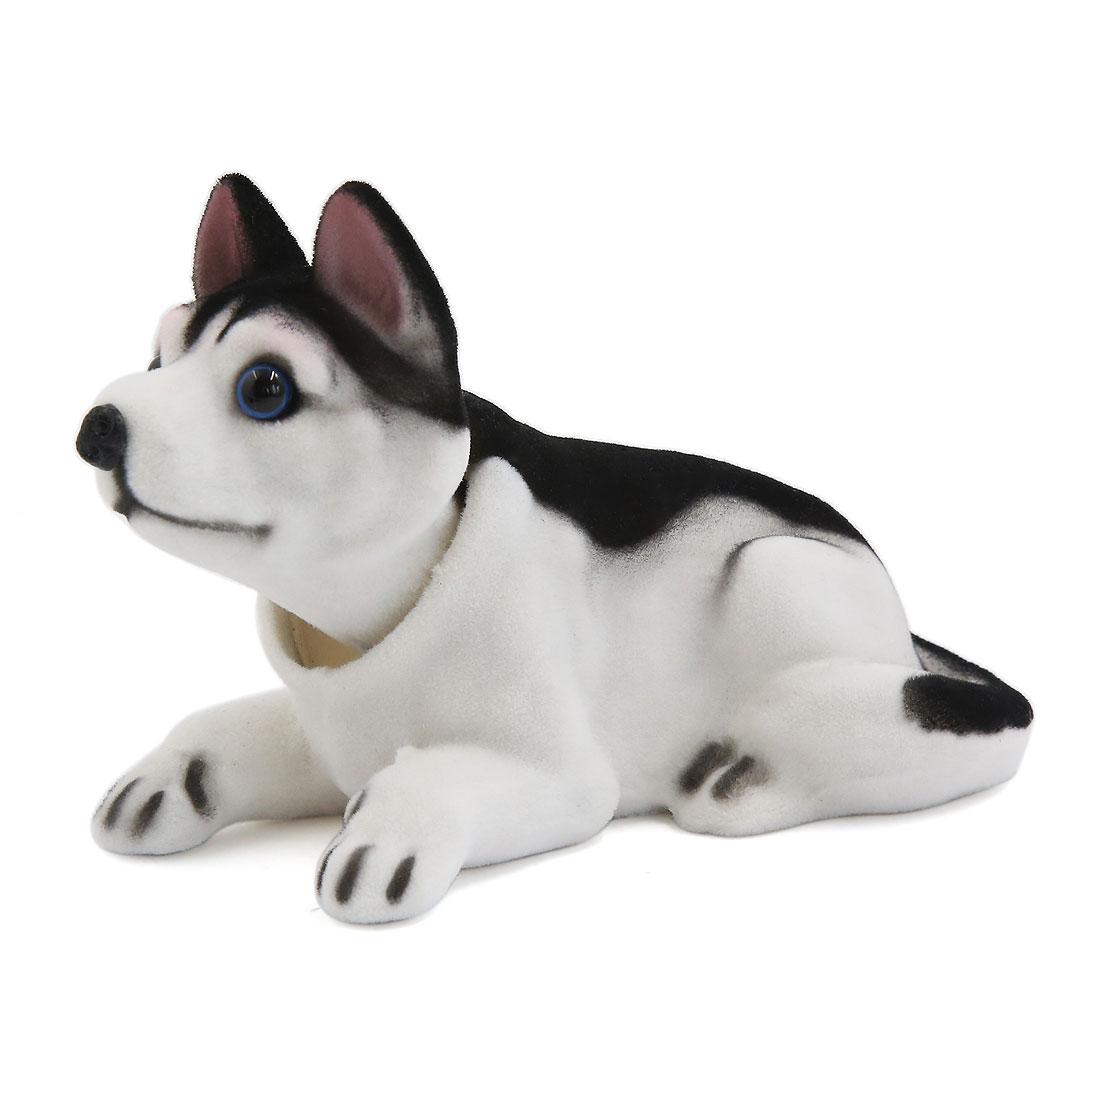 Car Interior Decor Bobbing Shaking Head Nodding Husky Dog Ornament Black White